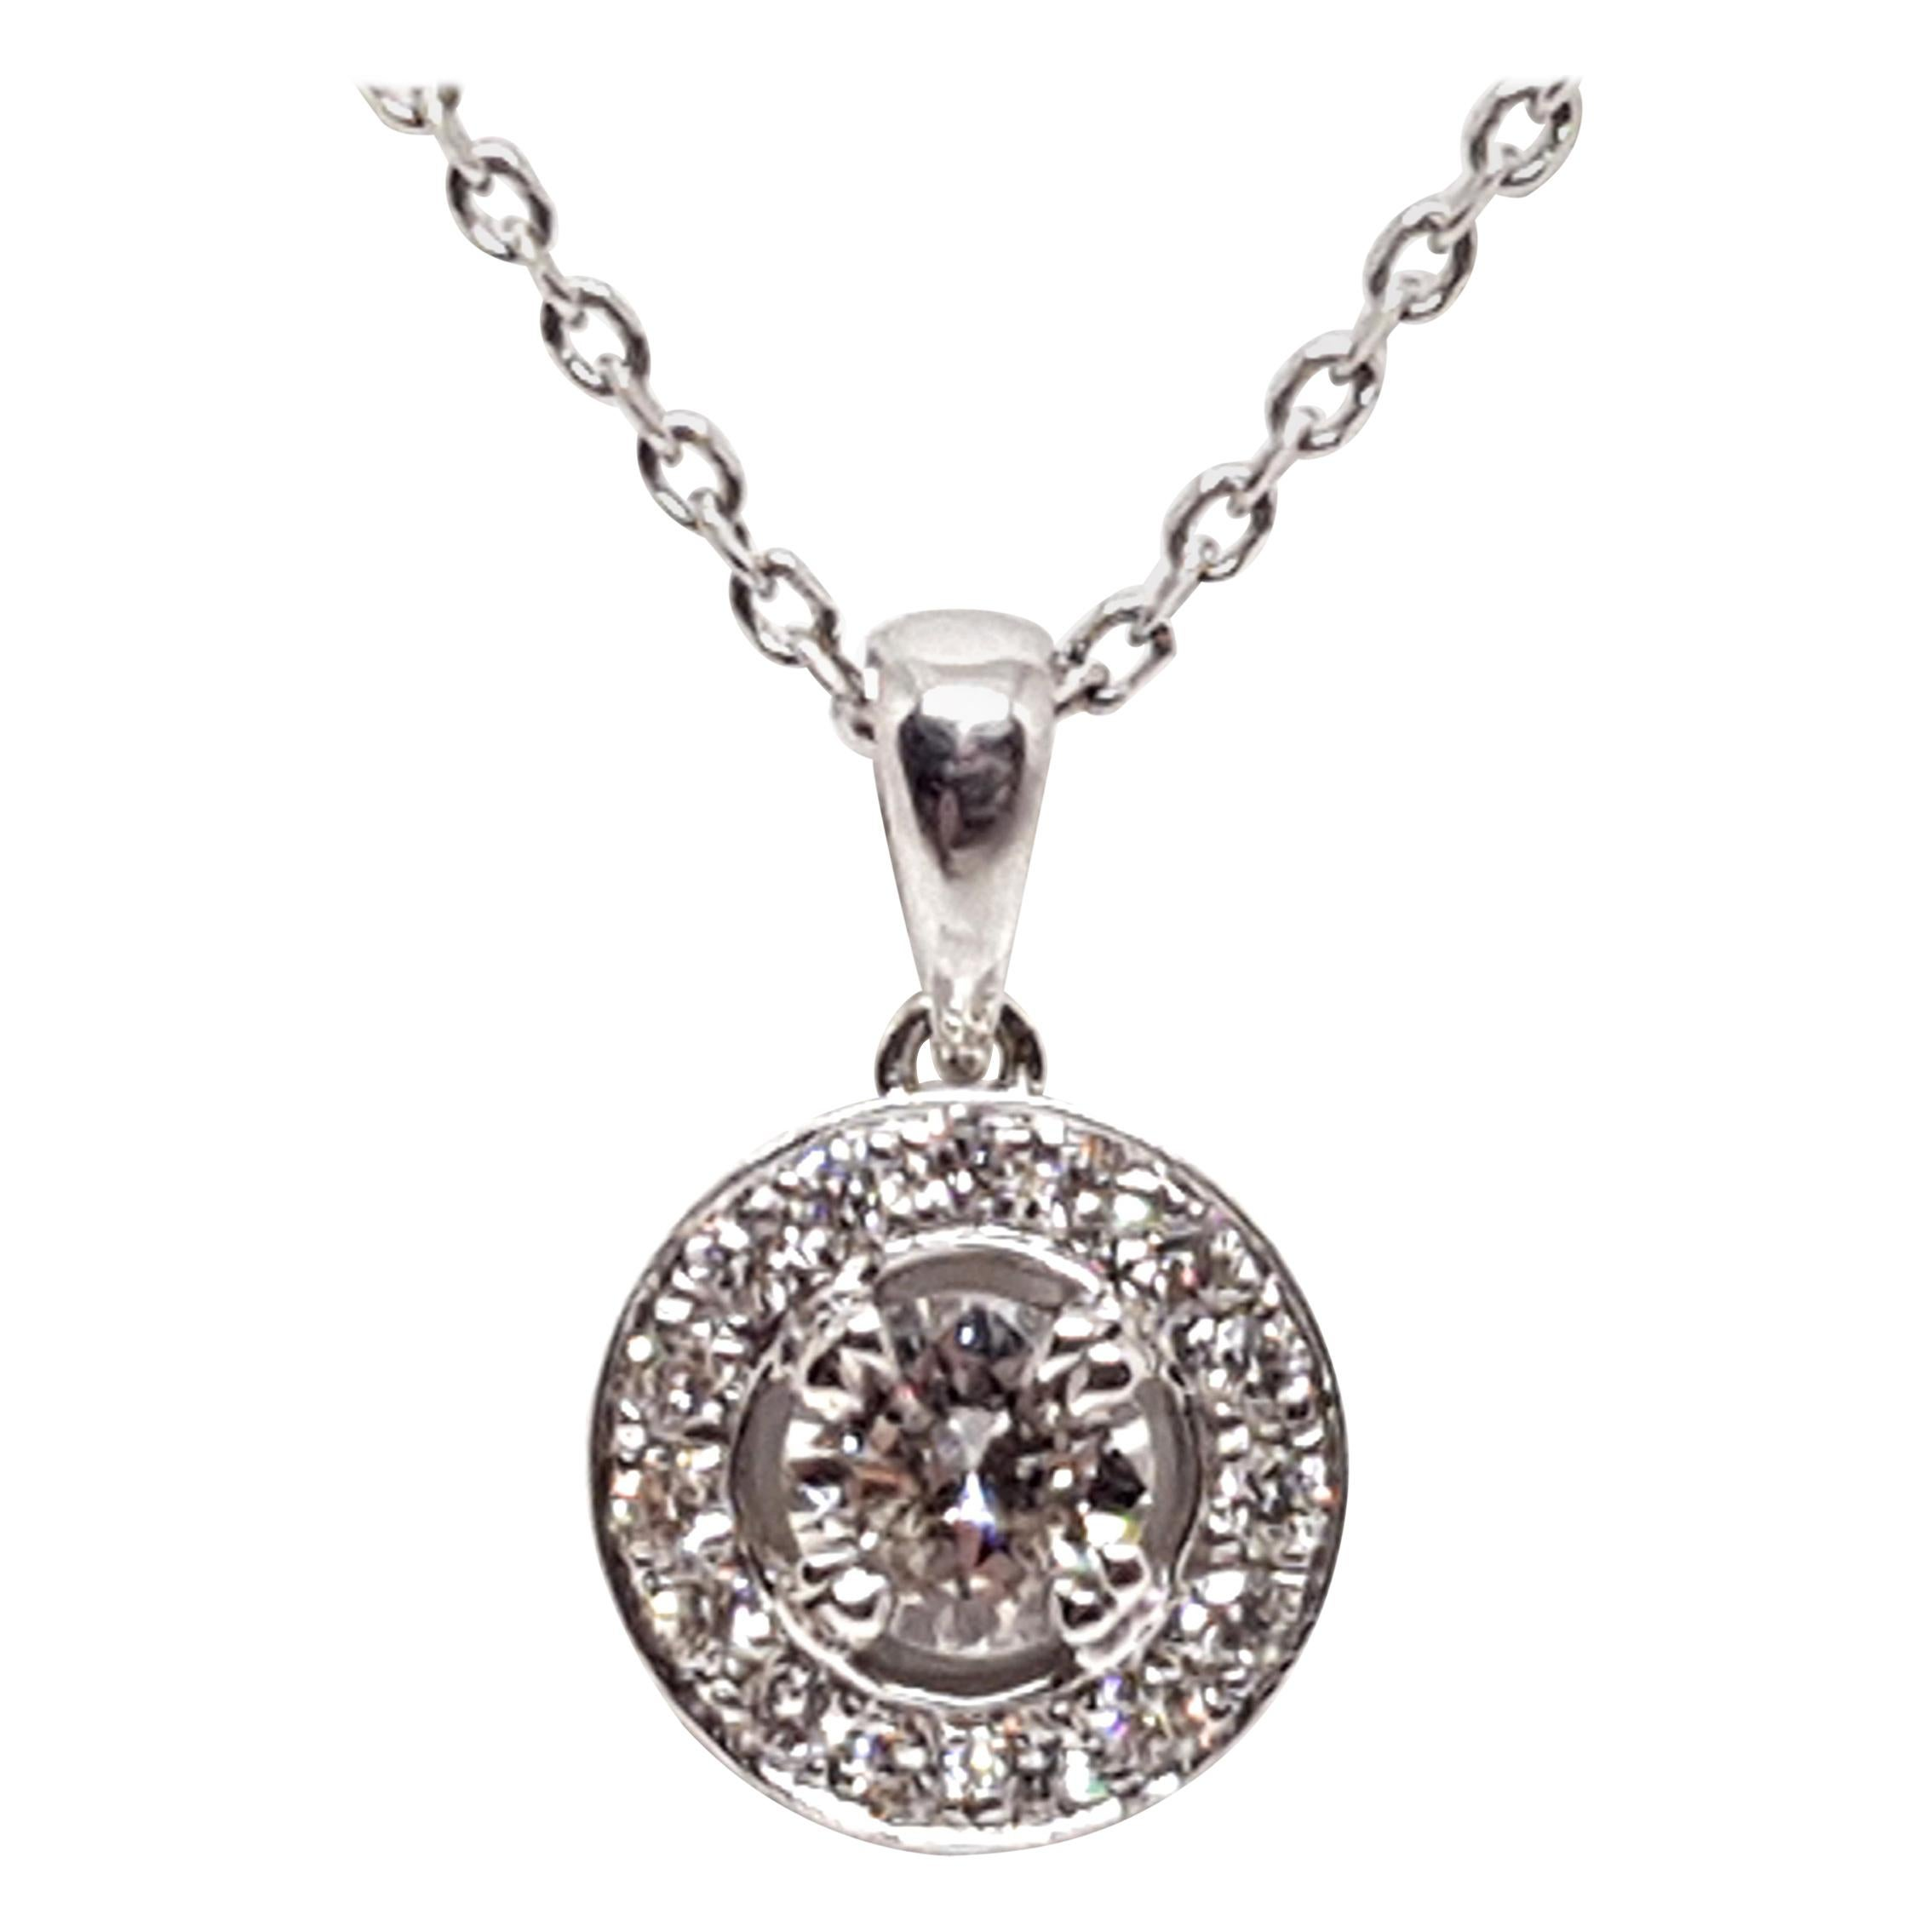 1.07 Carat White Gold Necklace Diamond Halo Solitaire Pendant